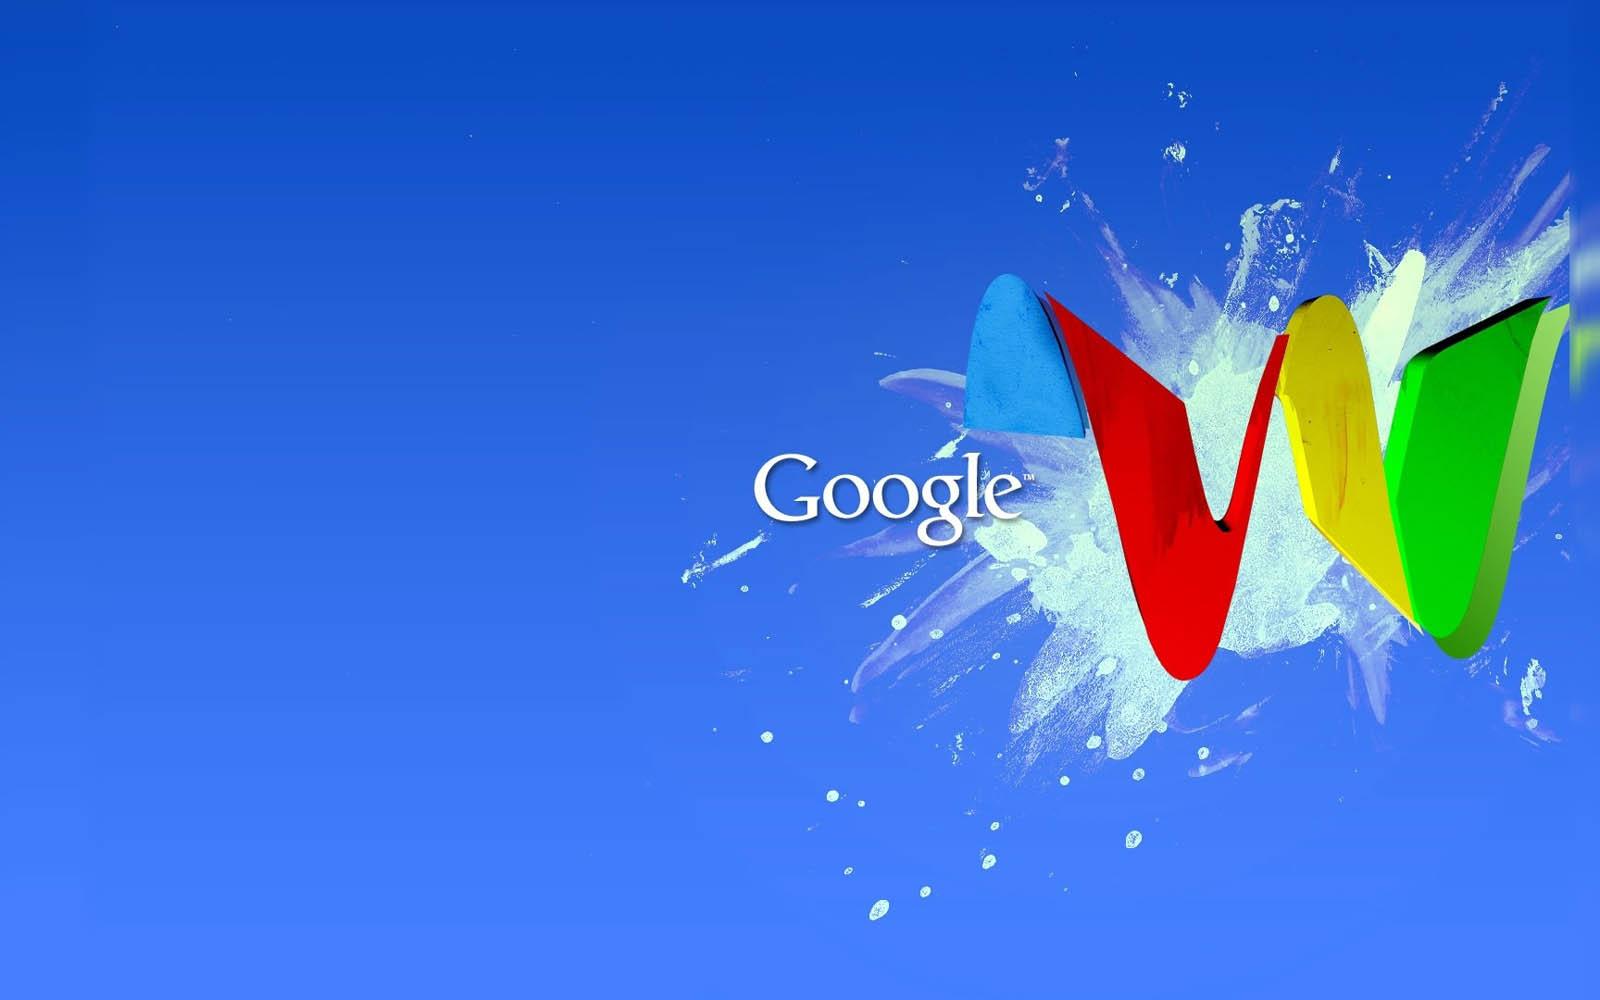 Google themes blue - Wallpapers Google Desktop Backgrounds